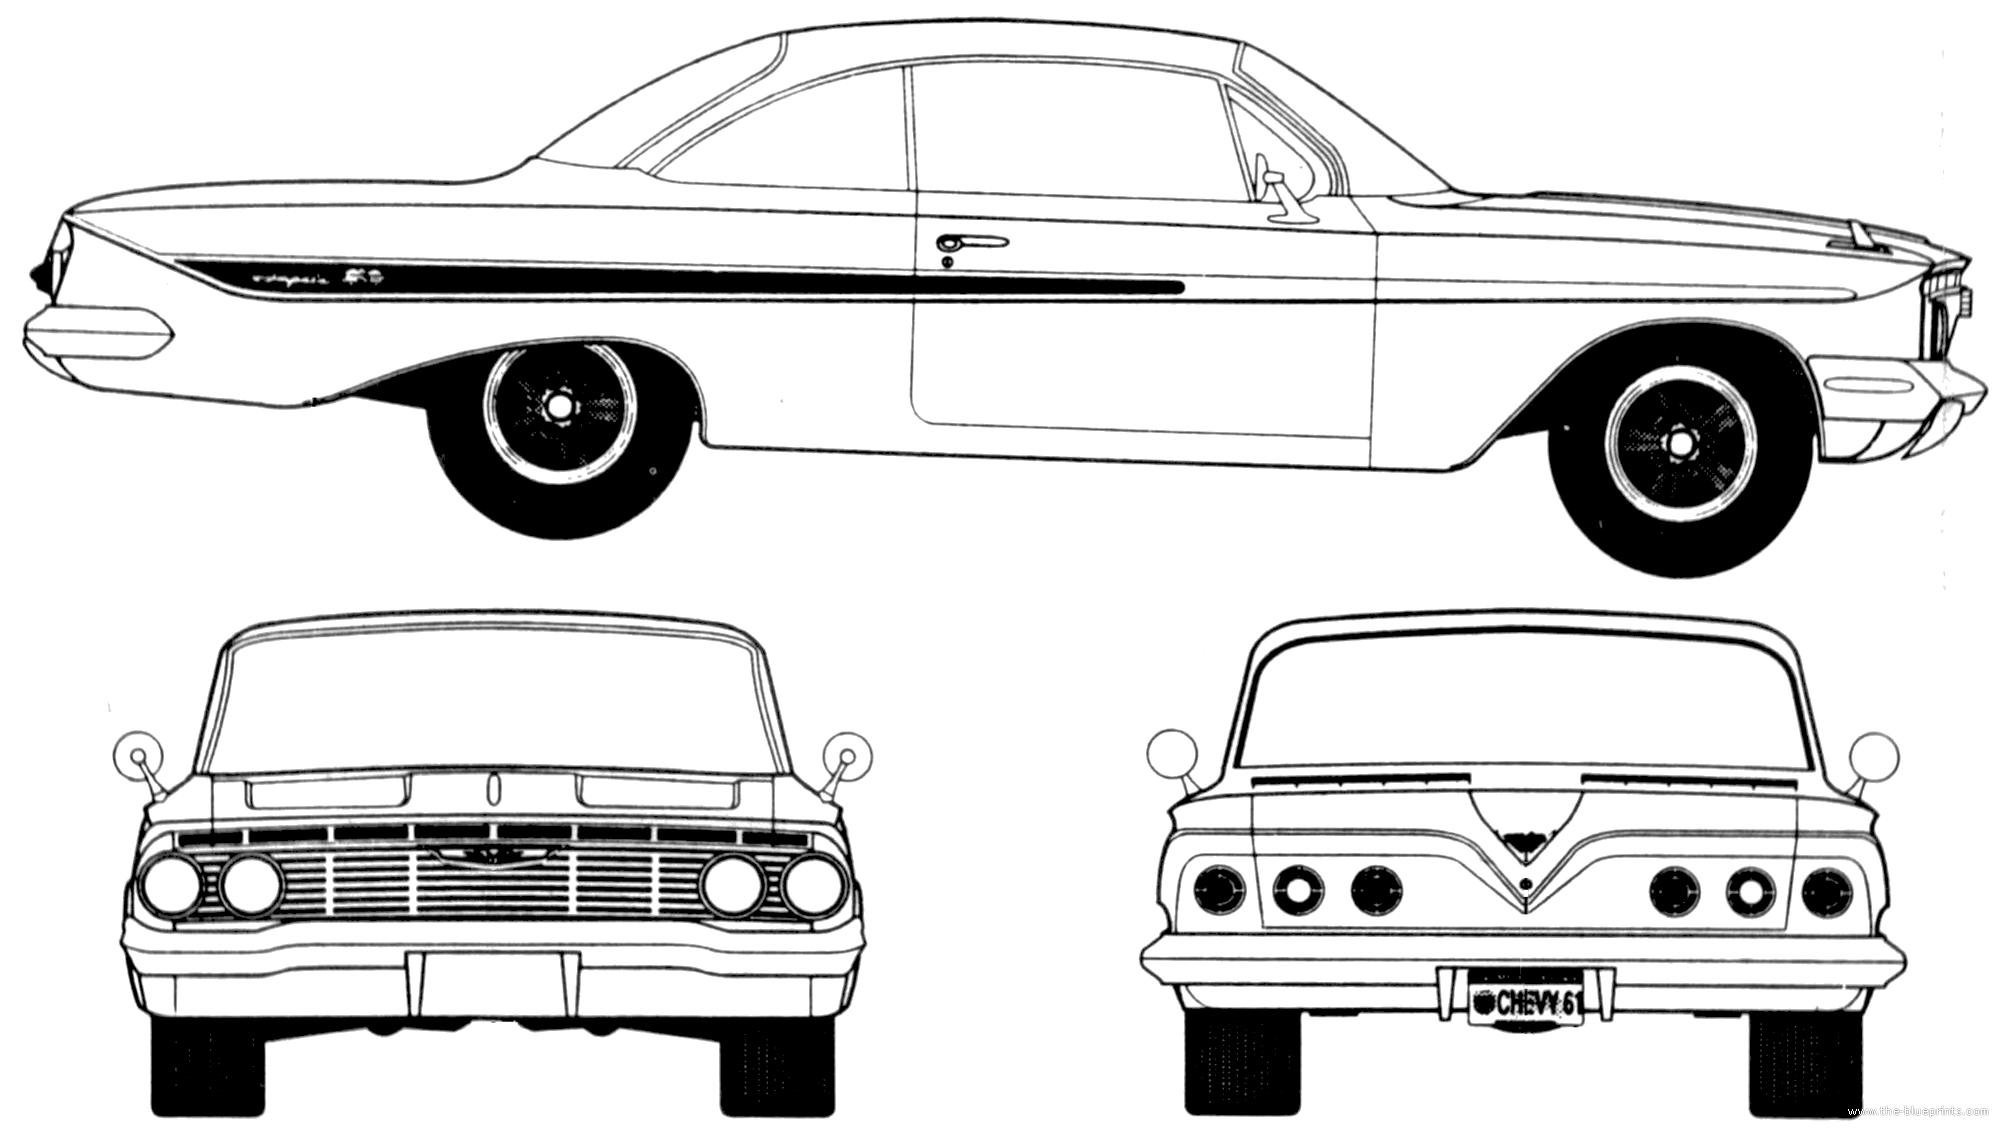 Blueprints Gt Cars Gt Chevrolet Gt Chevrolet Impala Sport